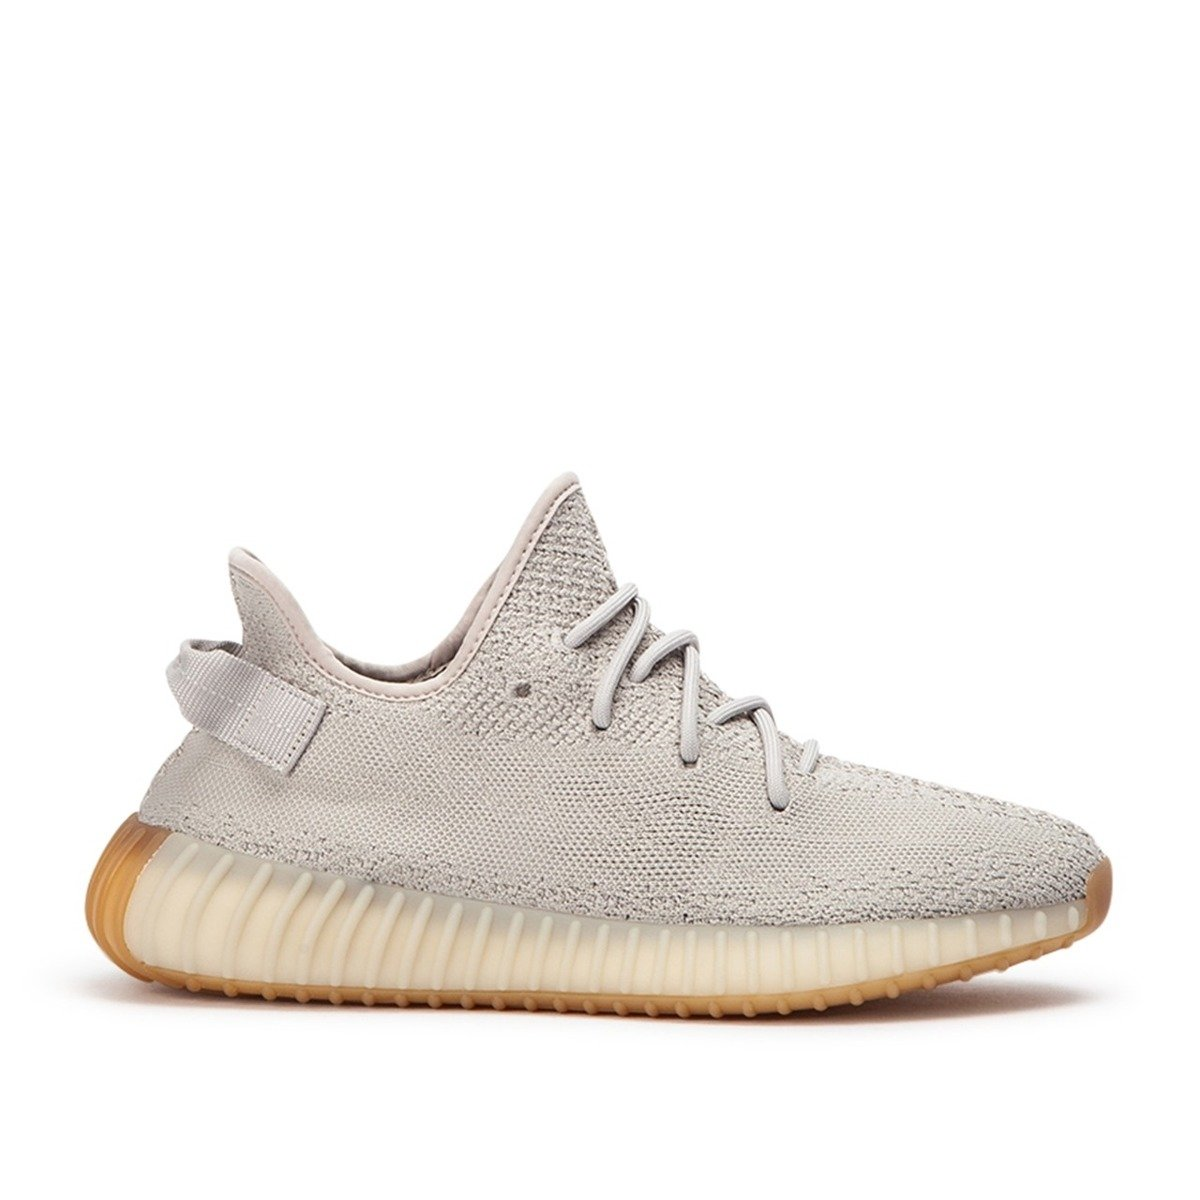 19ddcba70454 Adidas Yeezy Boost 350 V2 Sesame Shoes F99710 f99710